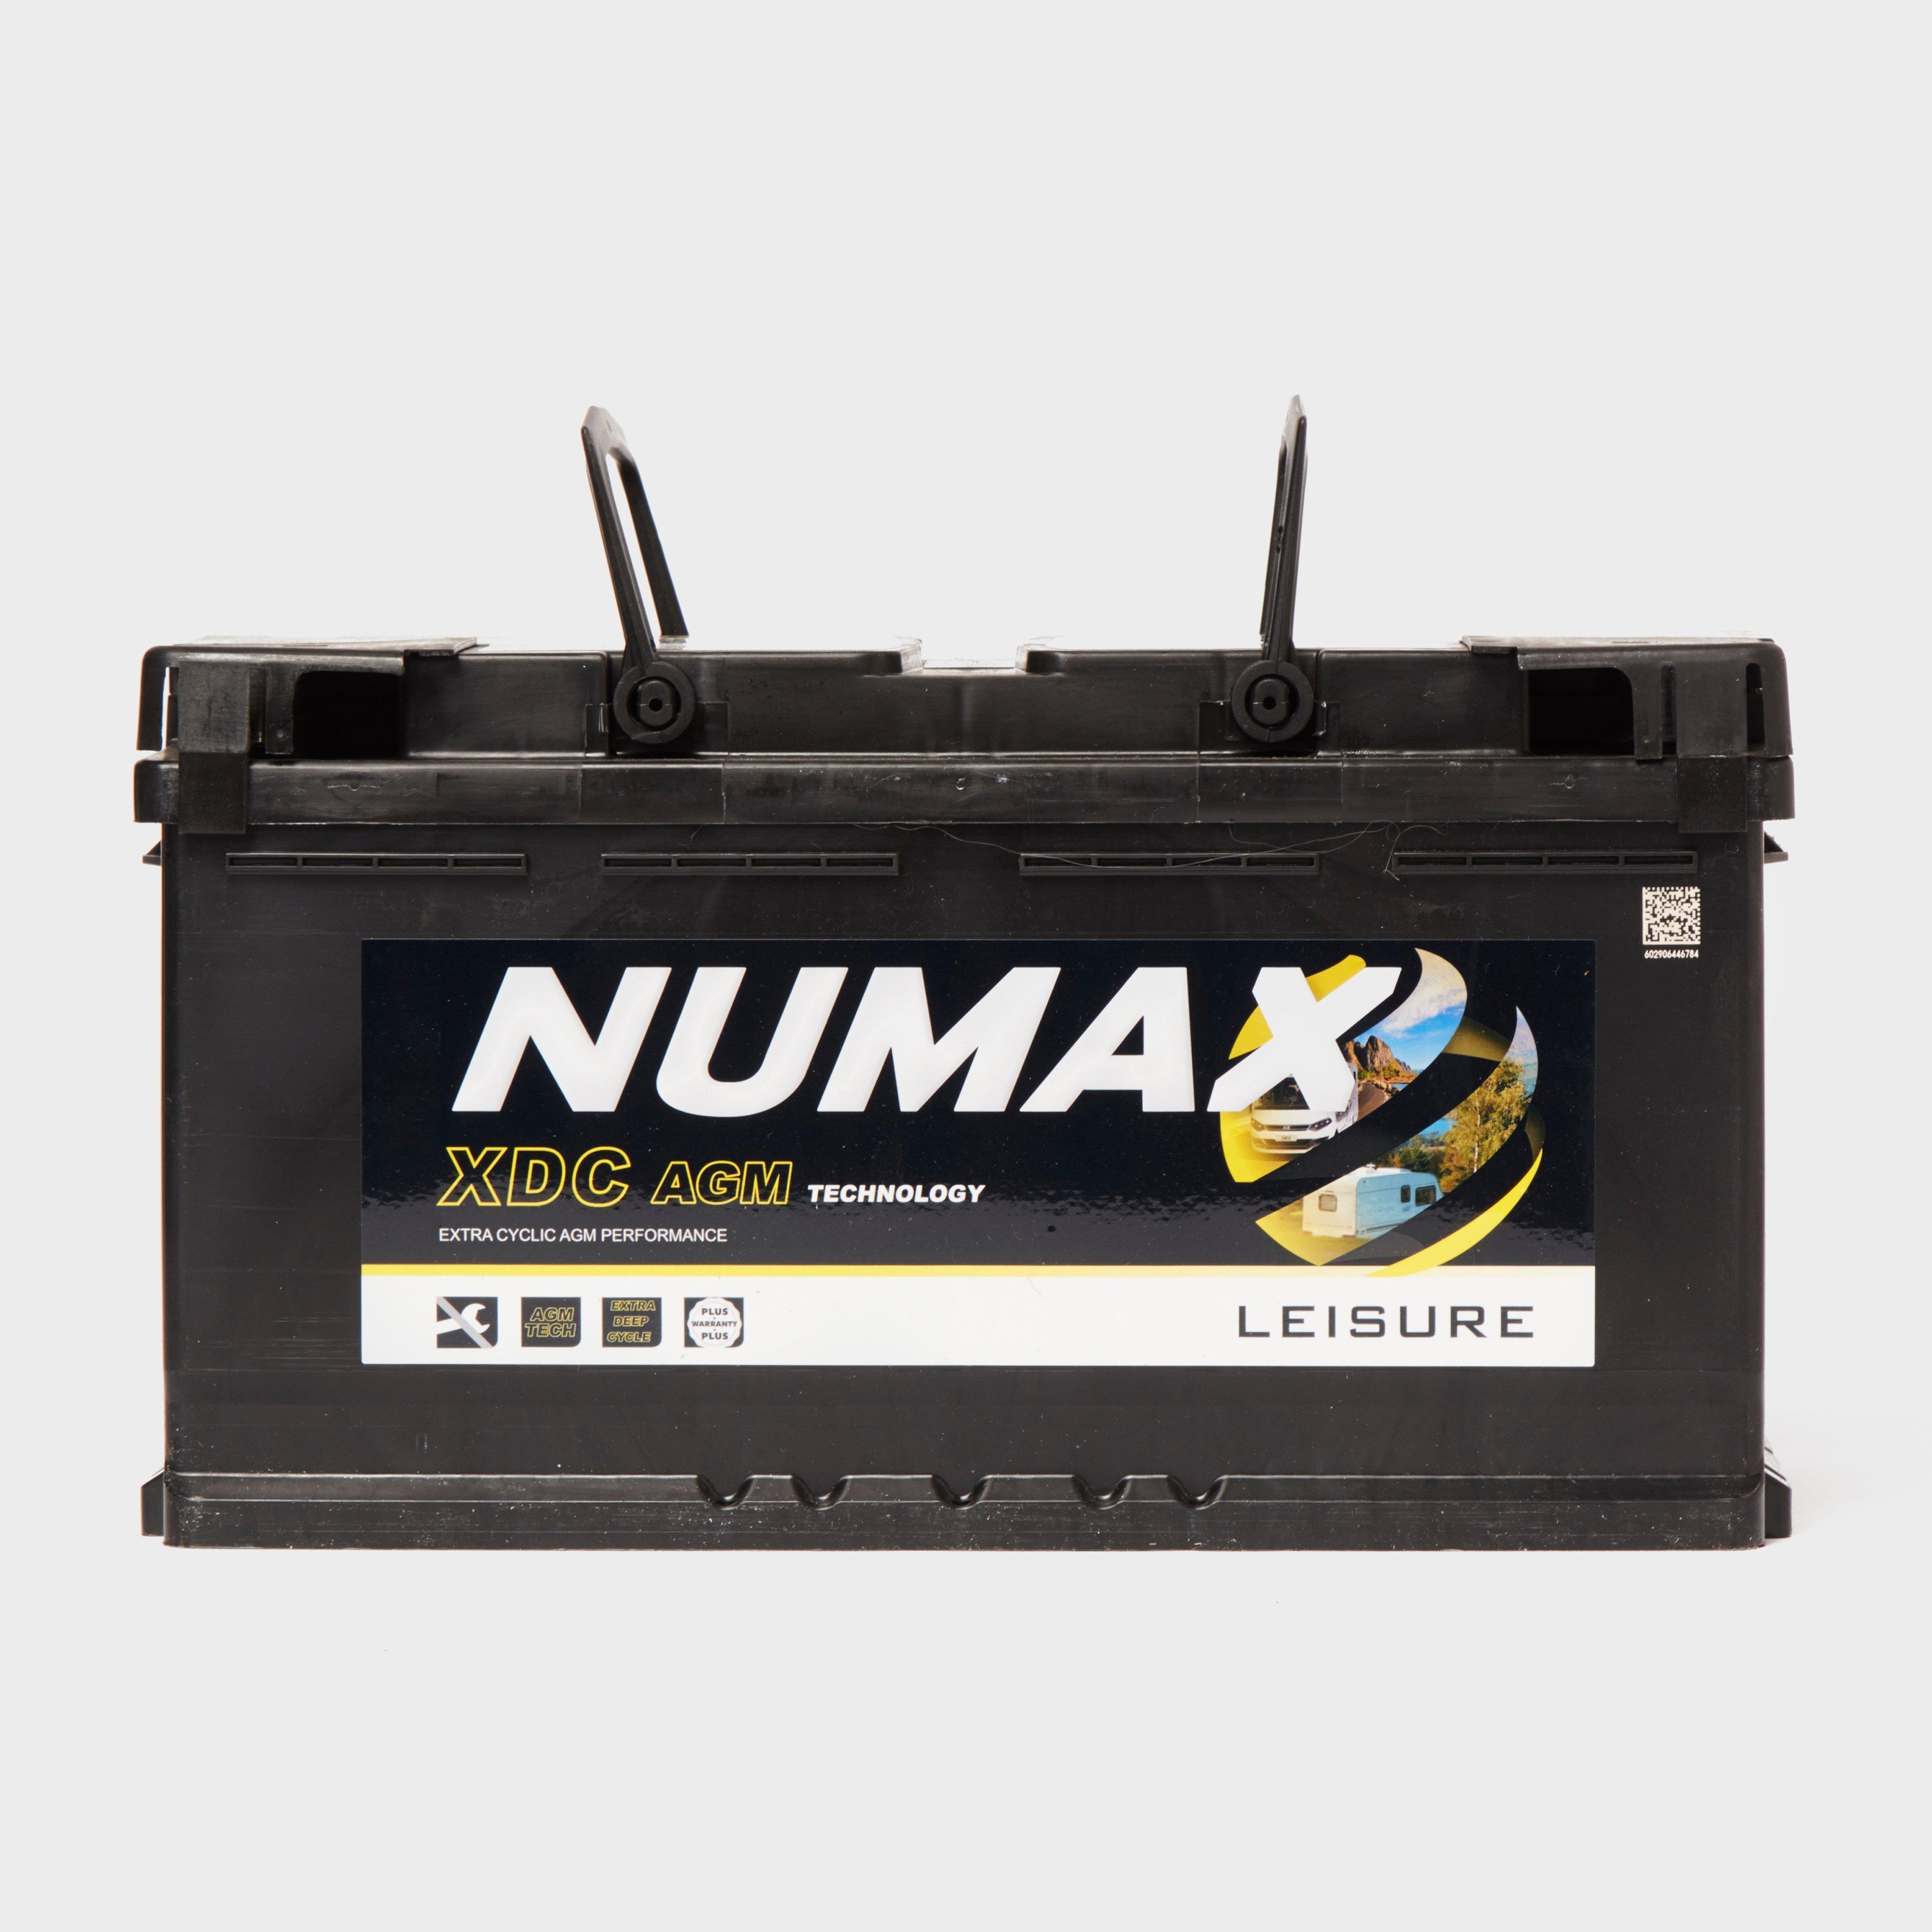 Numax Xdc25Agm 12V 95Ah Sealed Leisure Battery - Black, Black